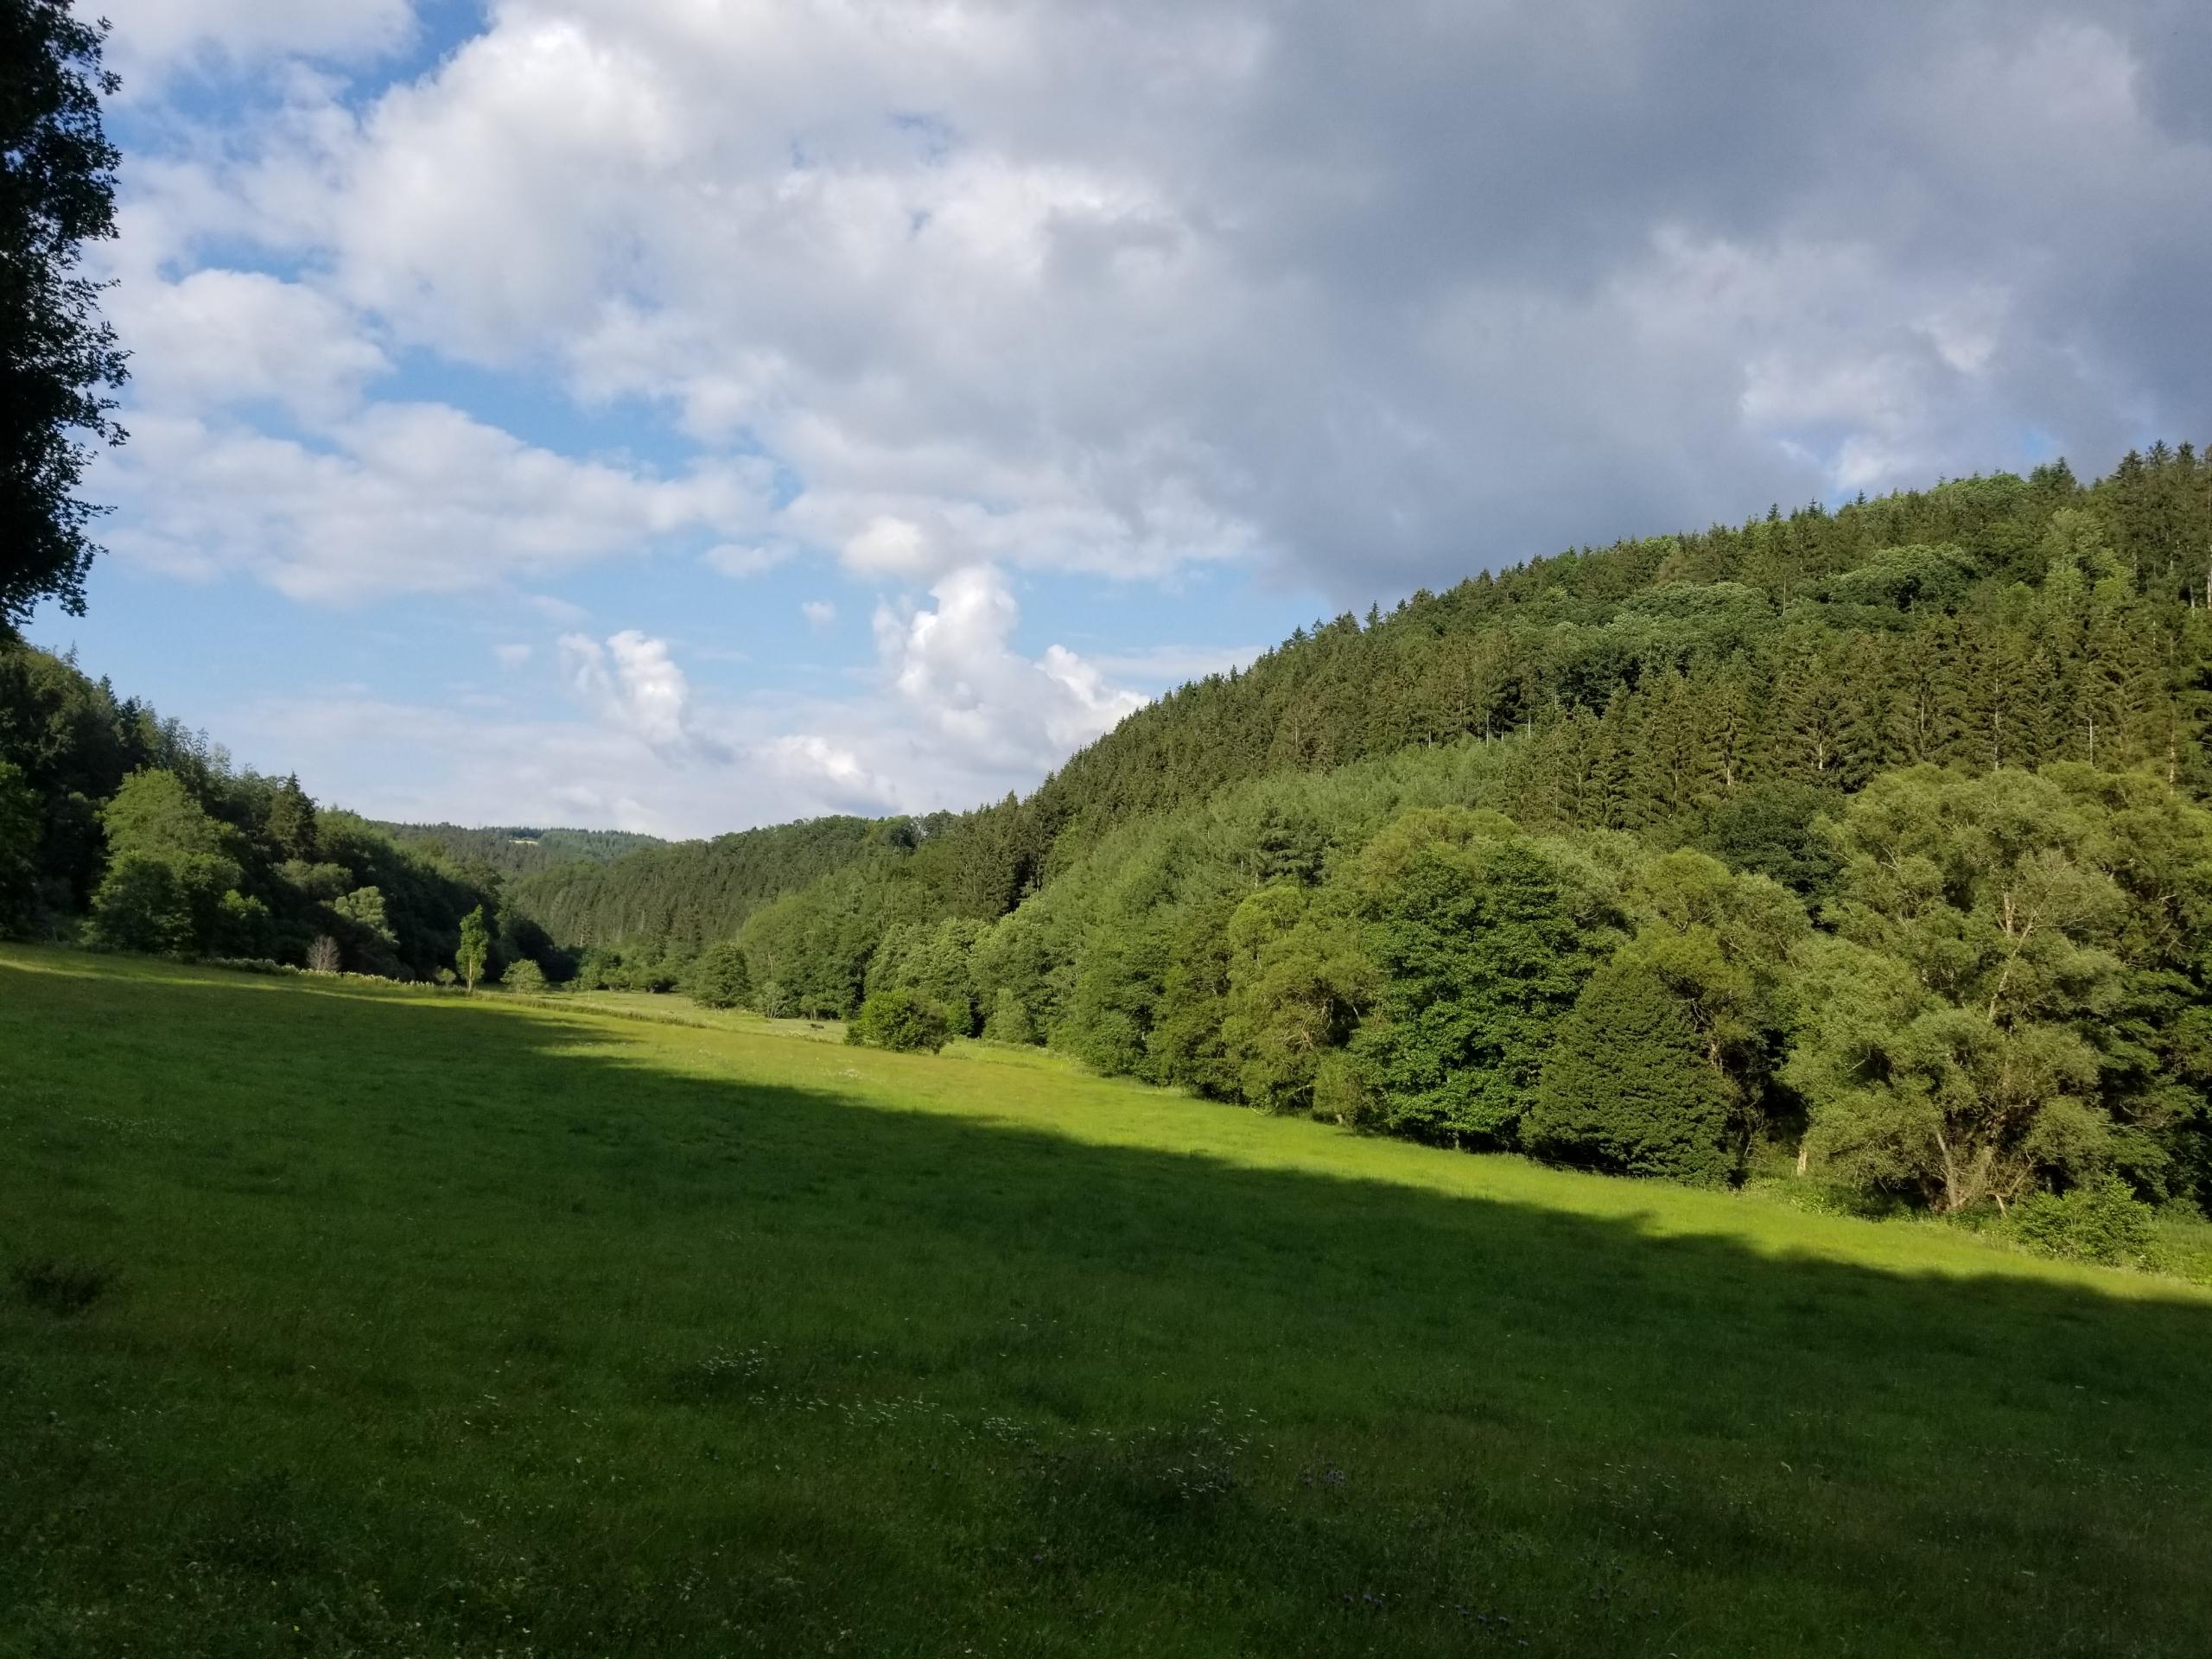 Lieser valley